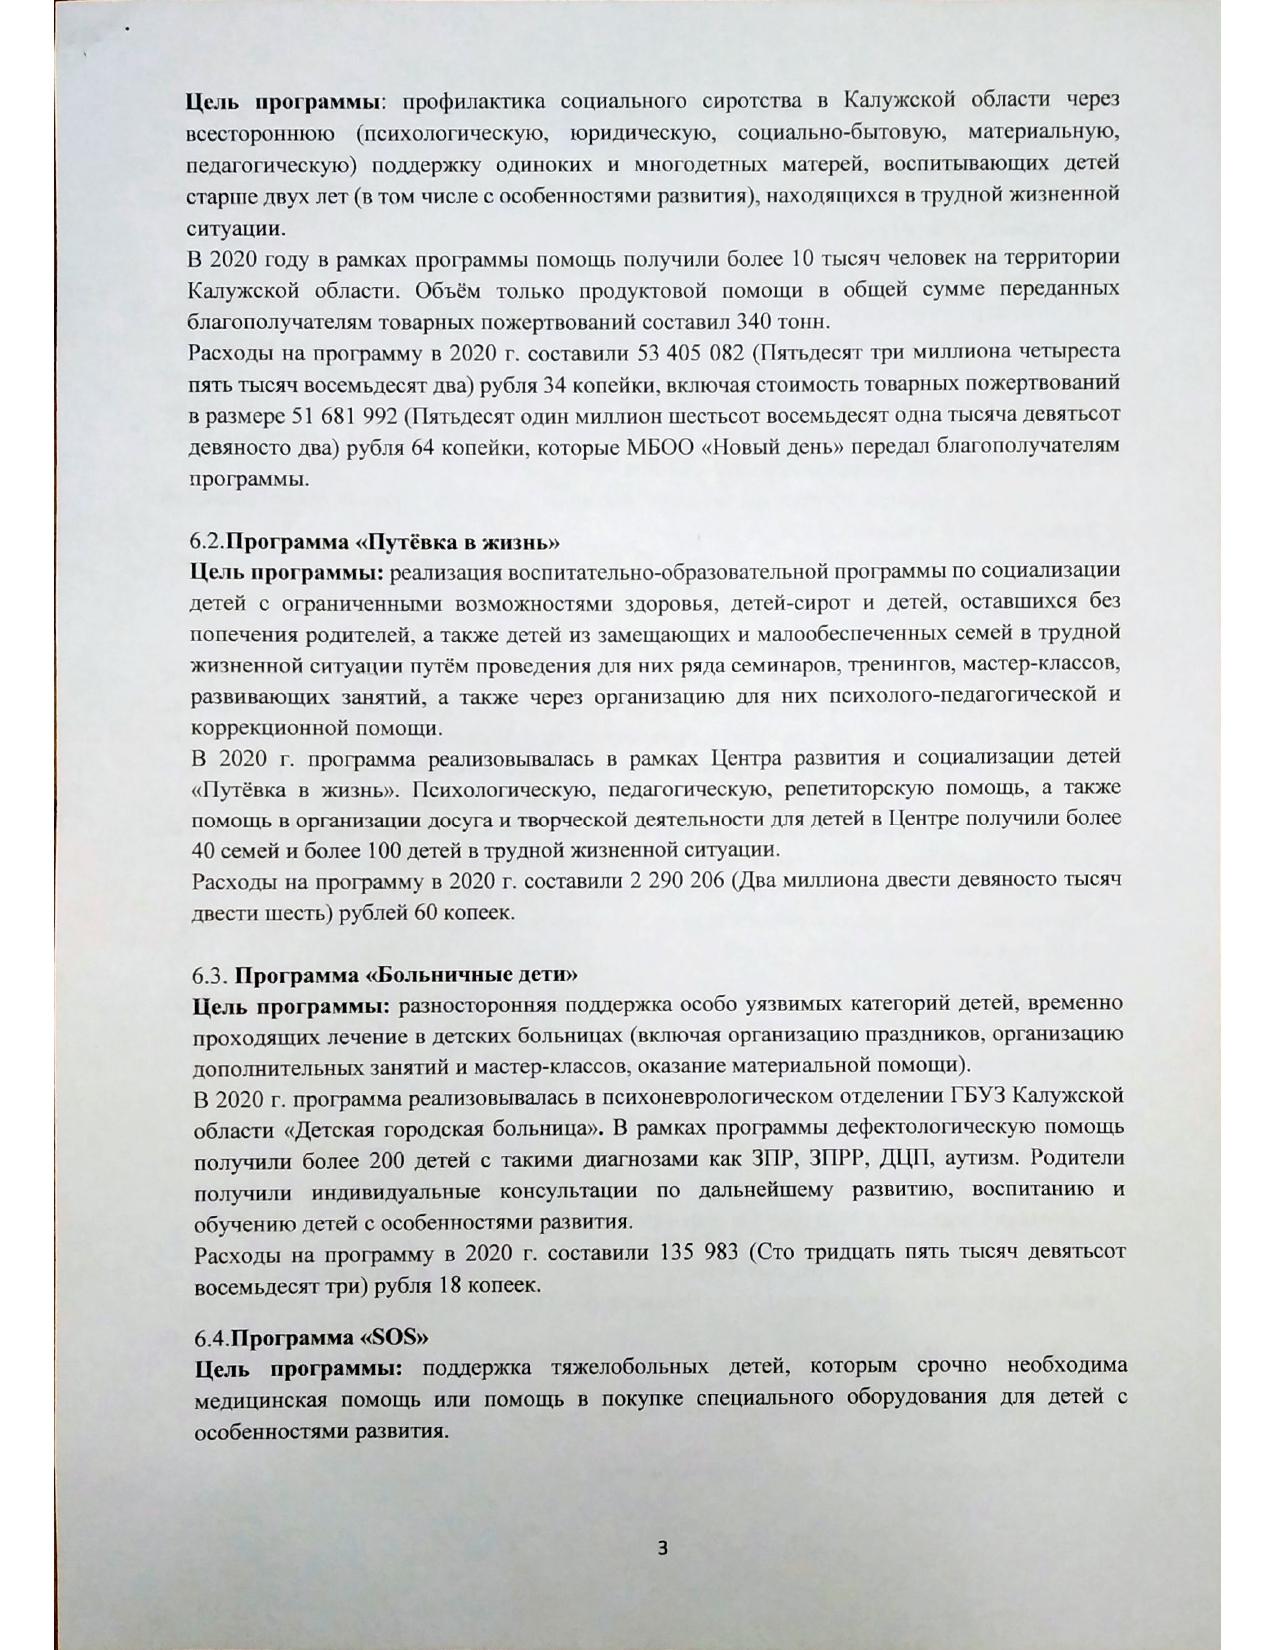 Отчет3_page-0001